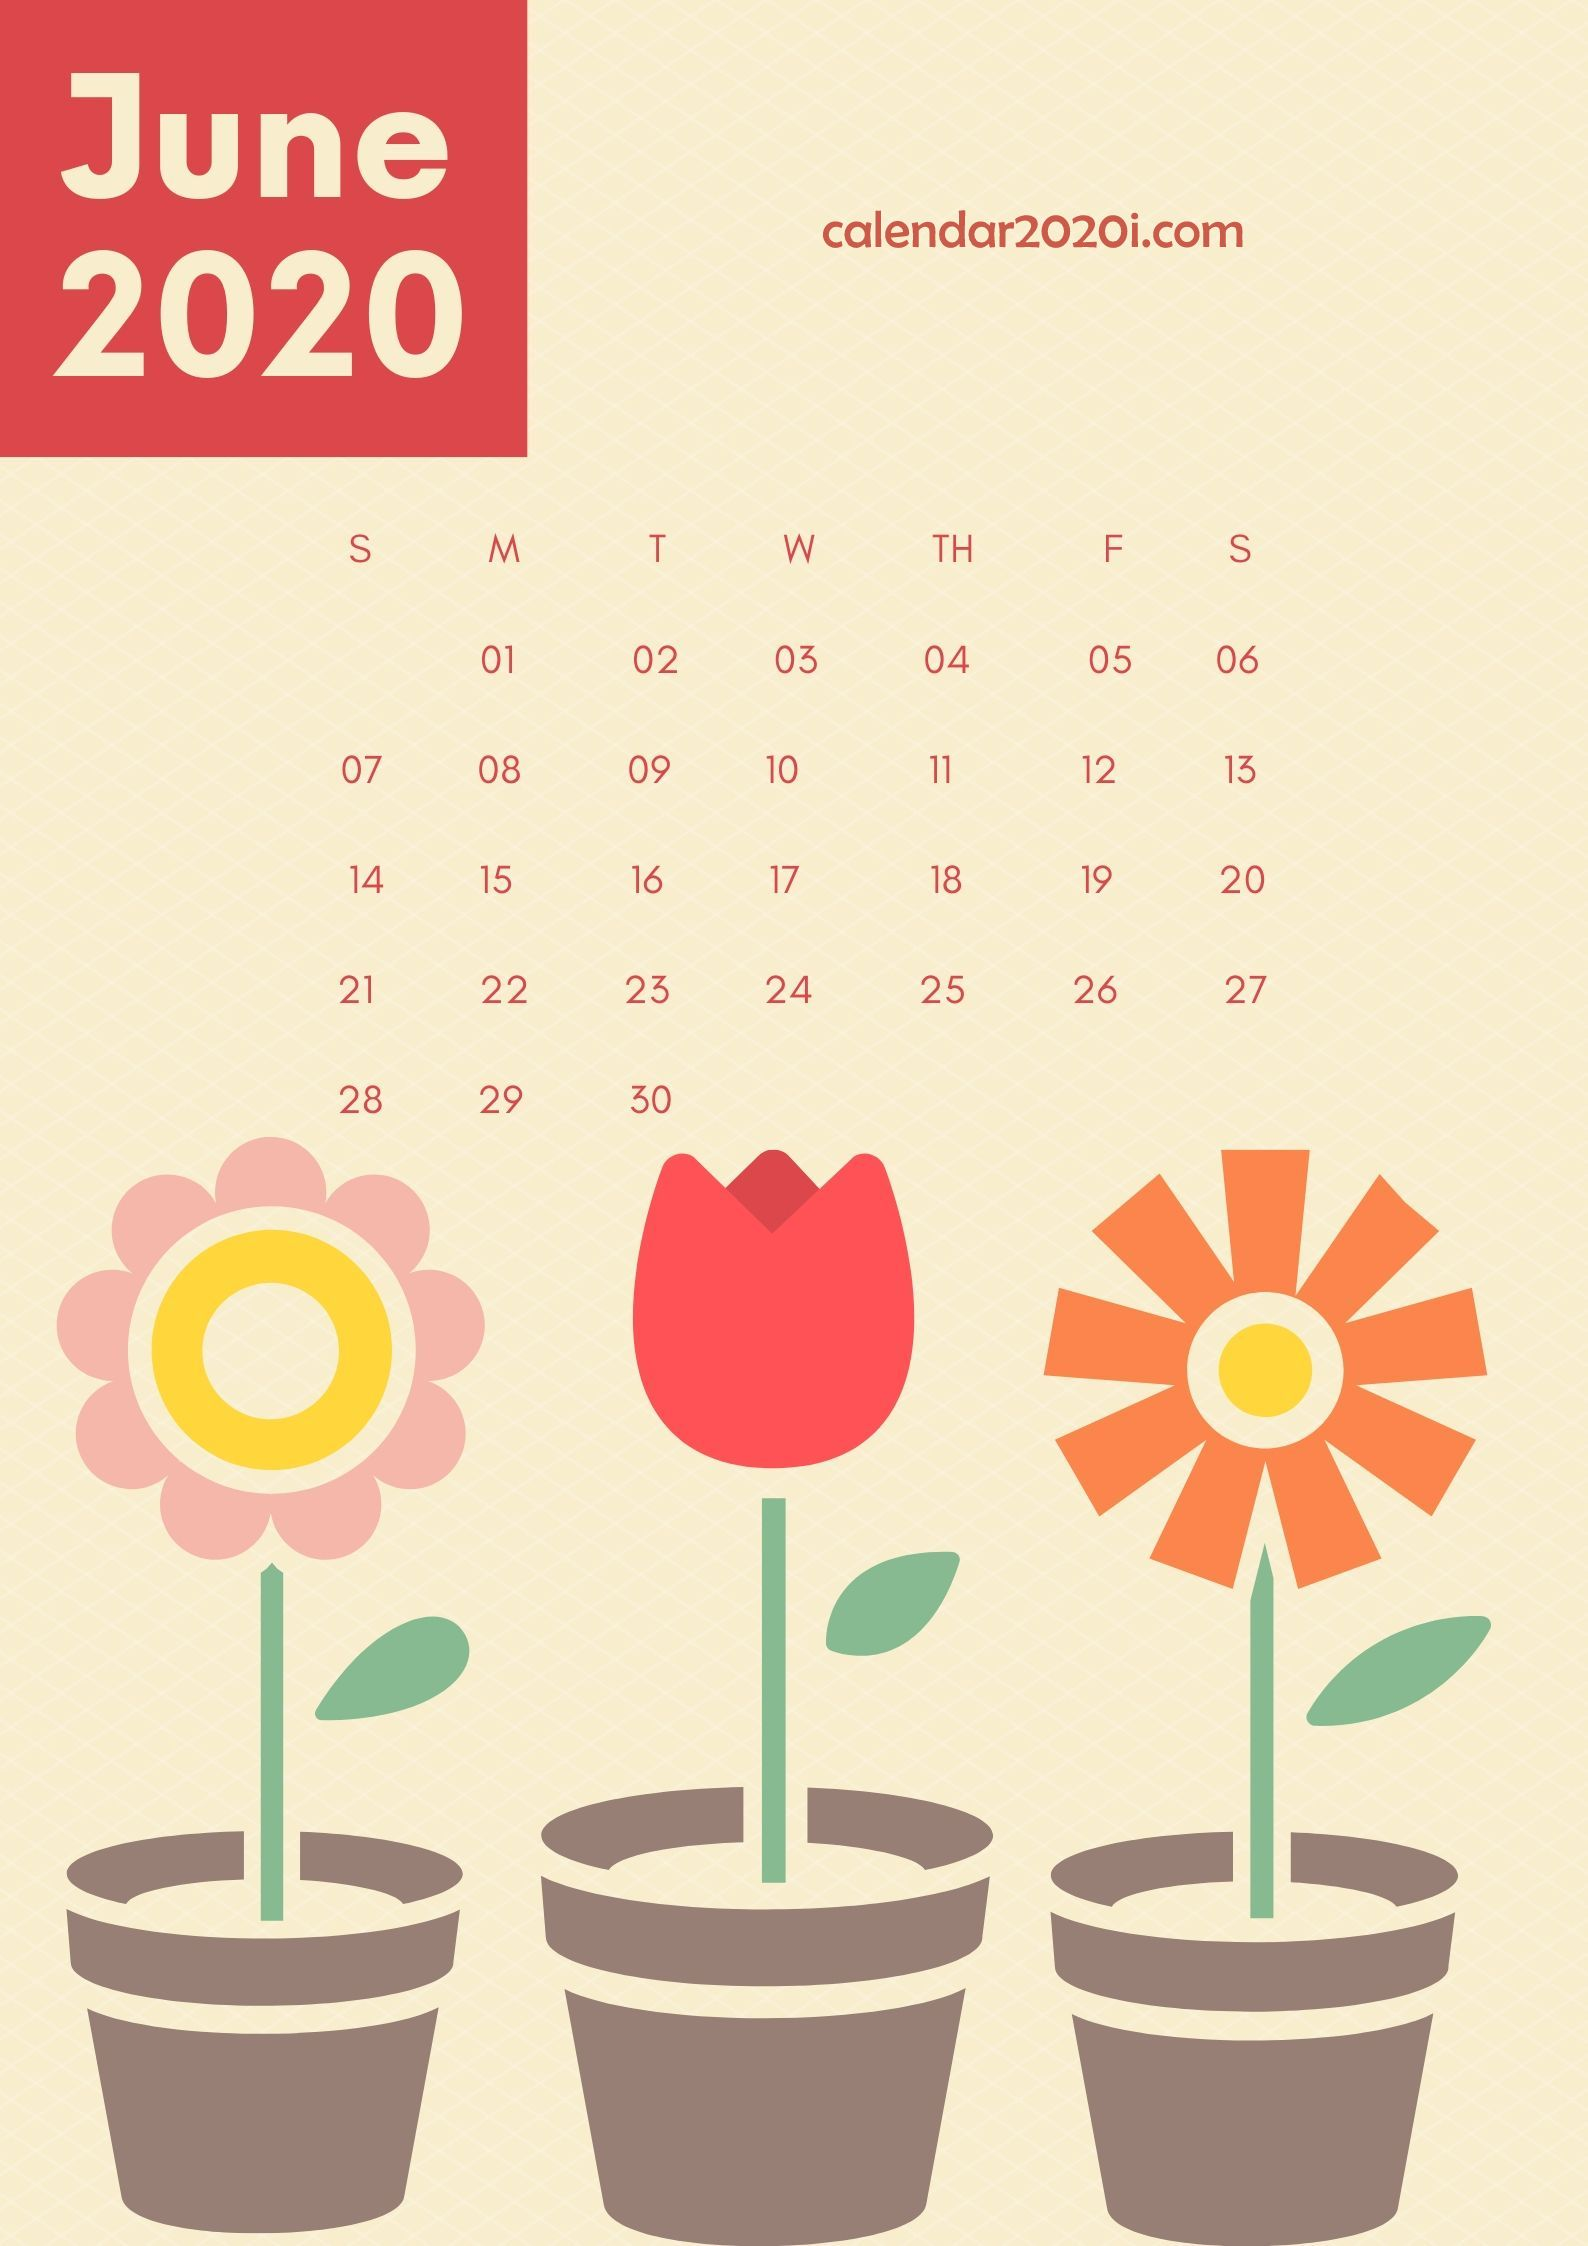 June 2020 Wall Calendar Printable